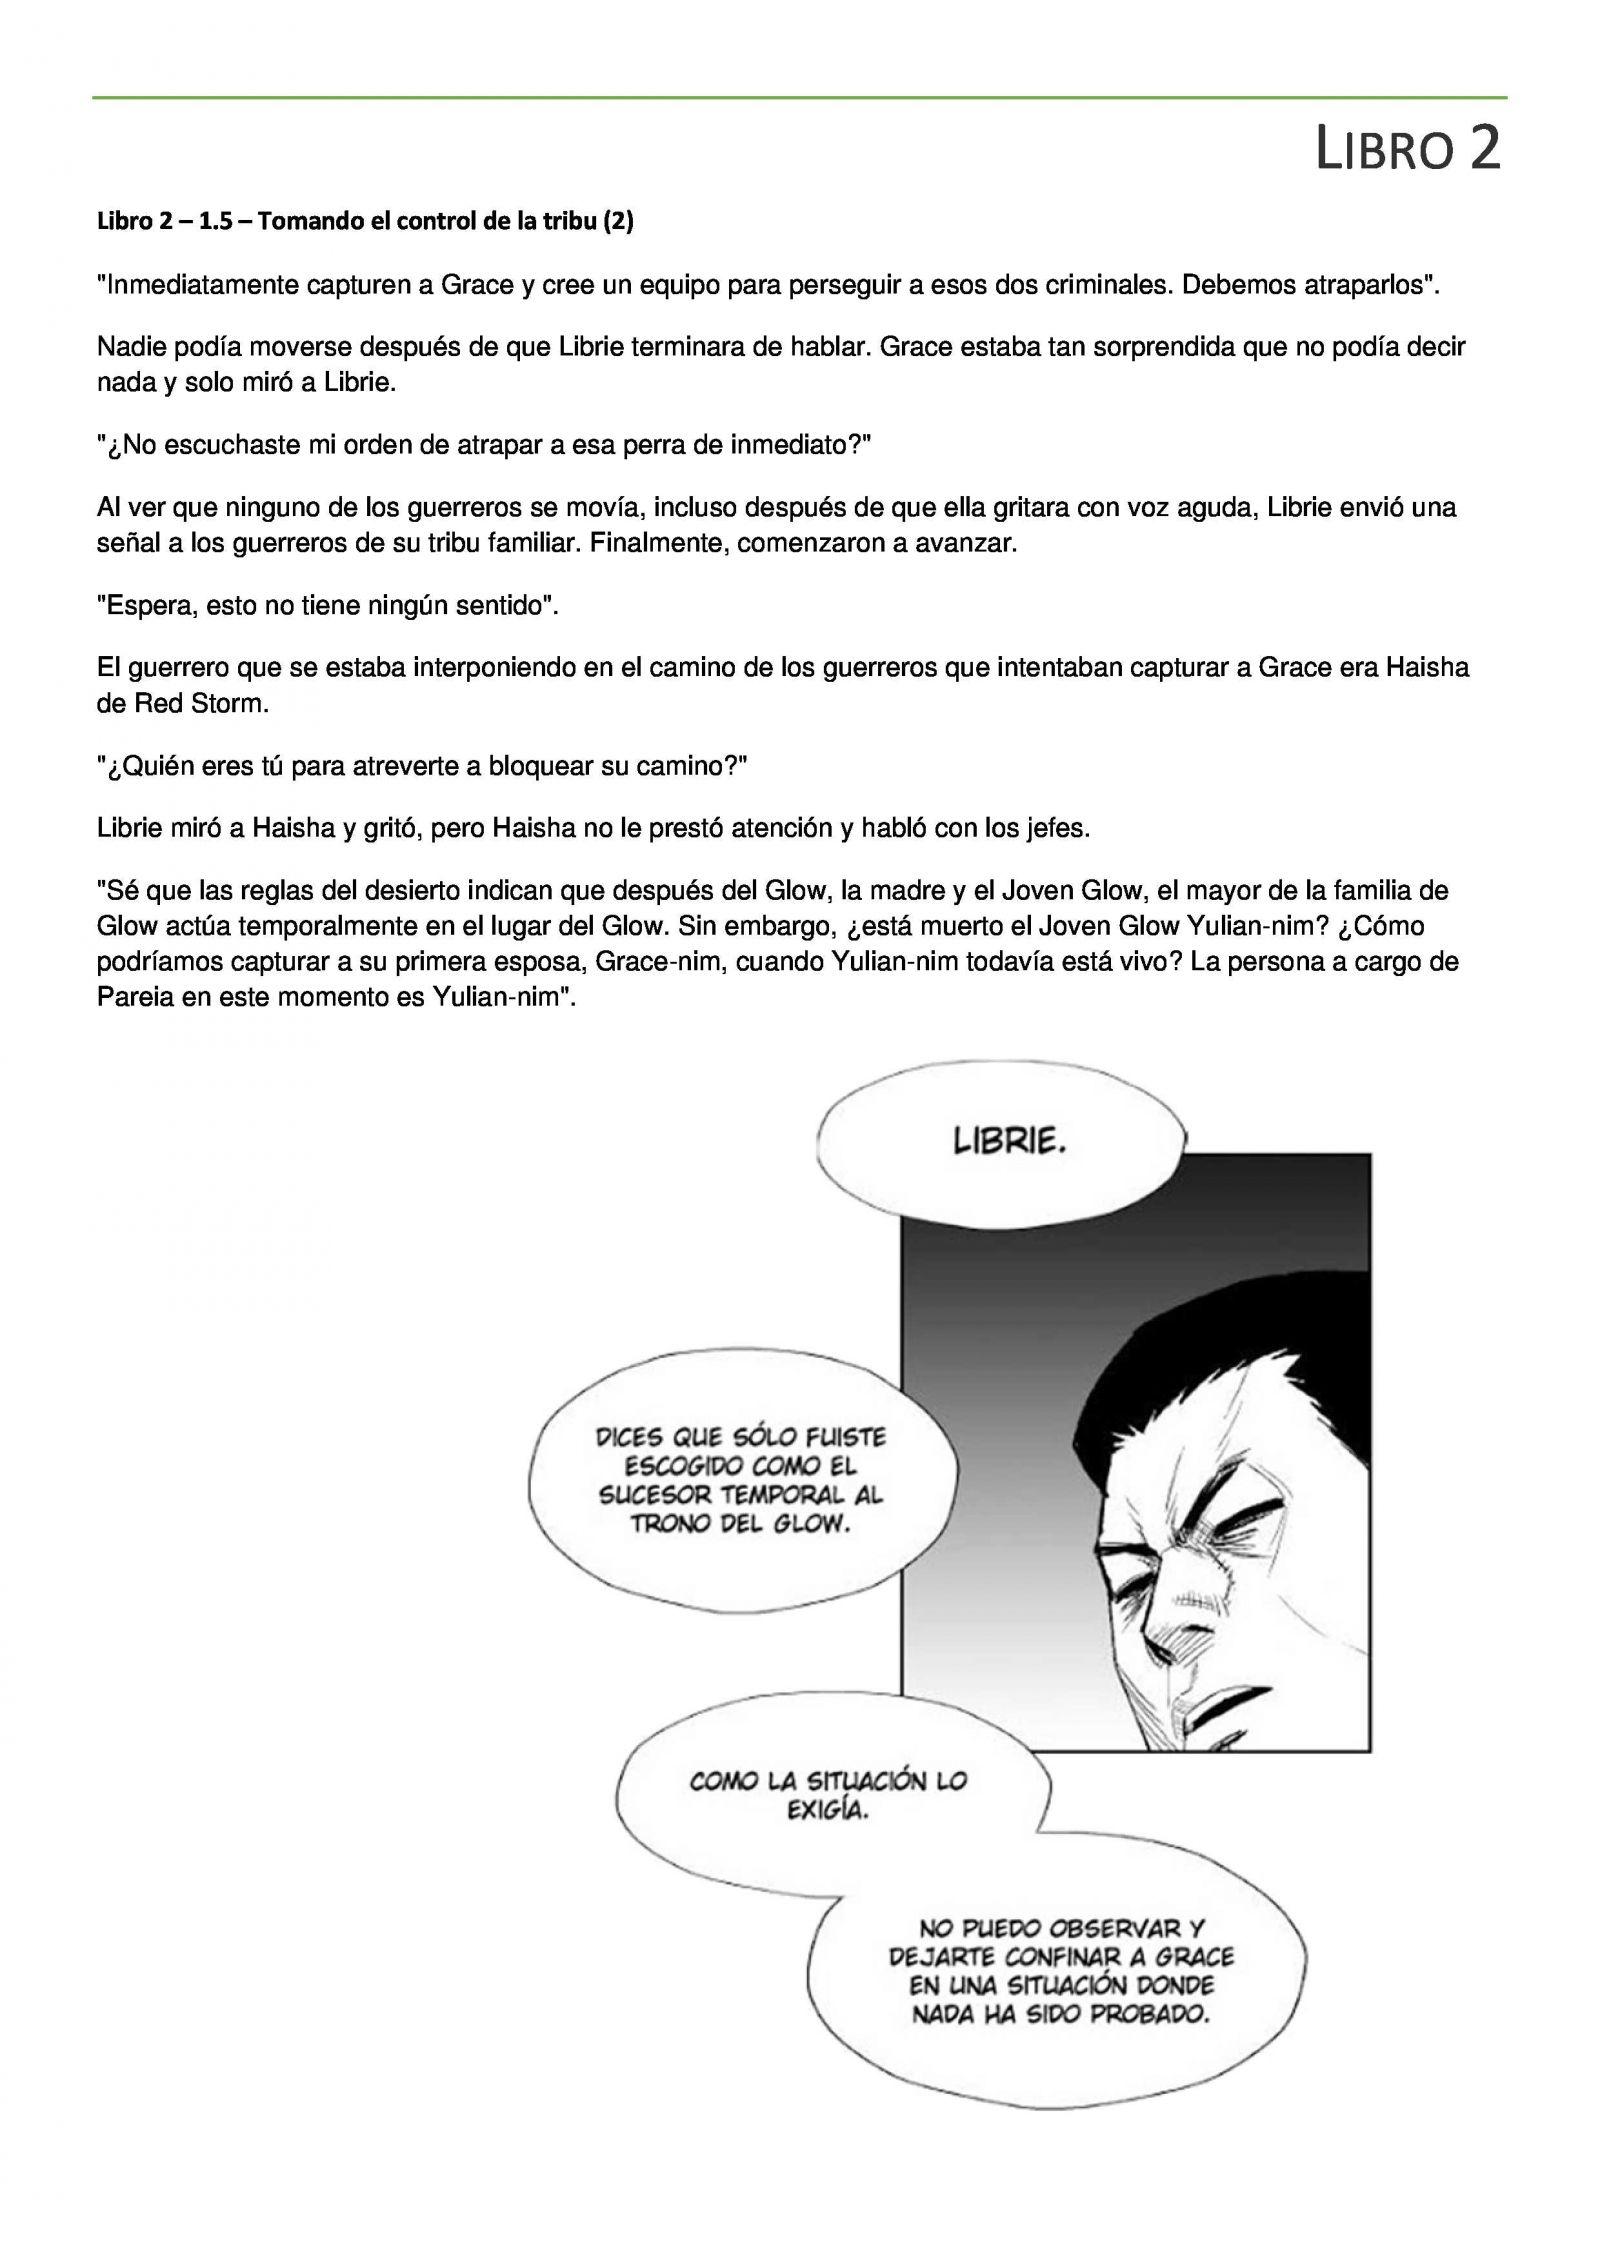 https://c9.mangatag.com/es_manga/pic4/55/24695/627319/926ec030f29f83ce5318754fdb631a33.jpg Page 1